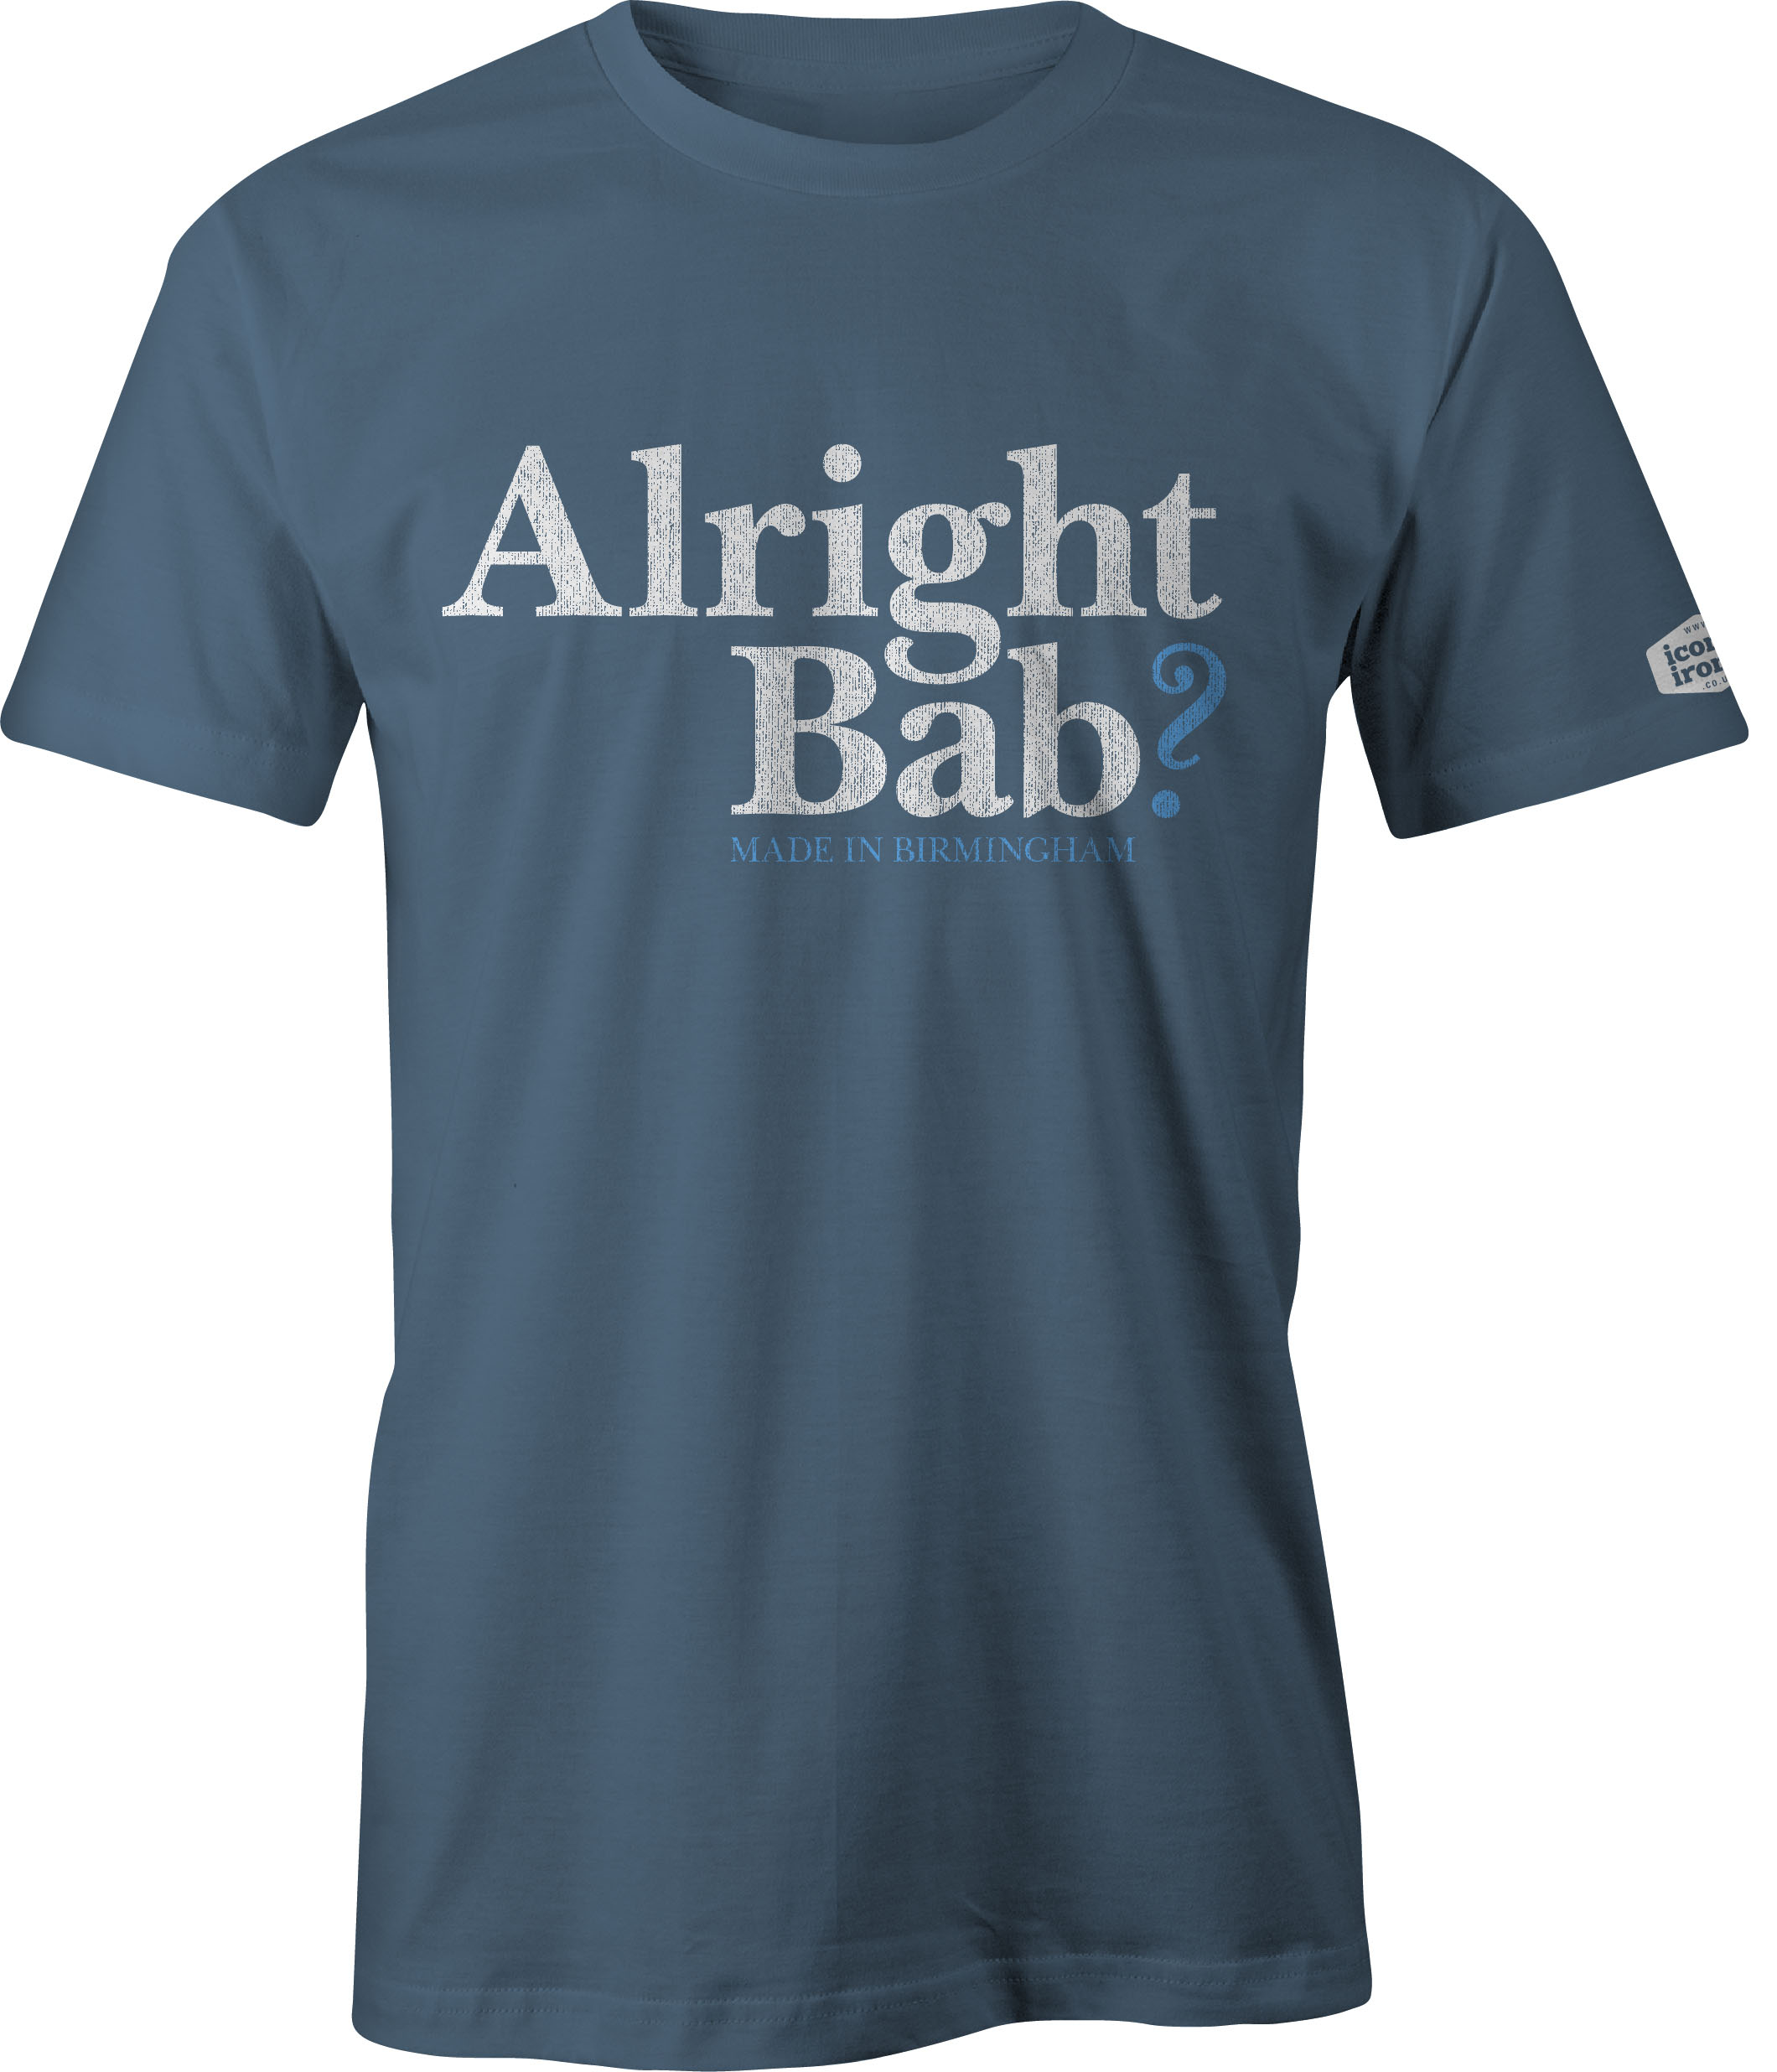 Alright Bab? Made In Birmingham t shirt in indigo blue